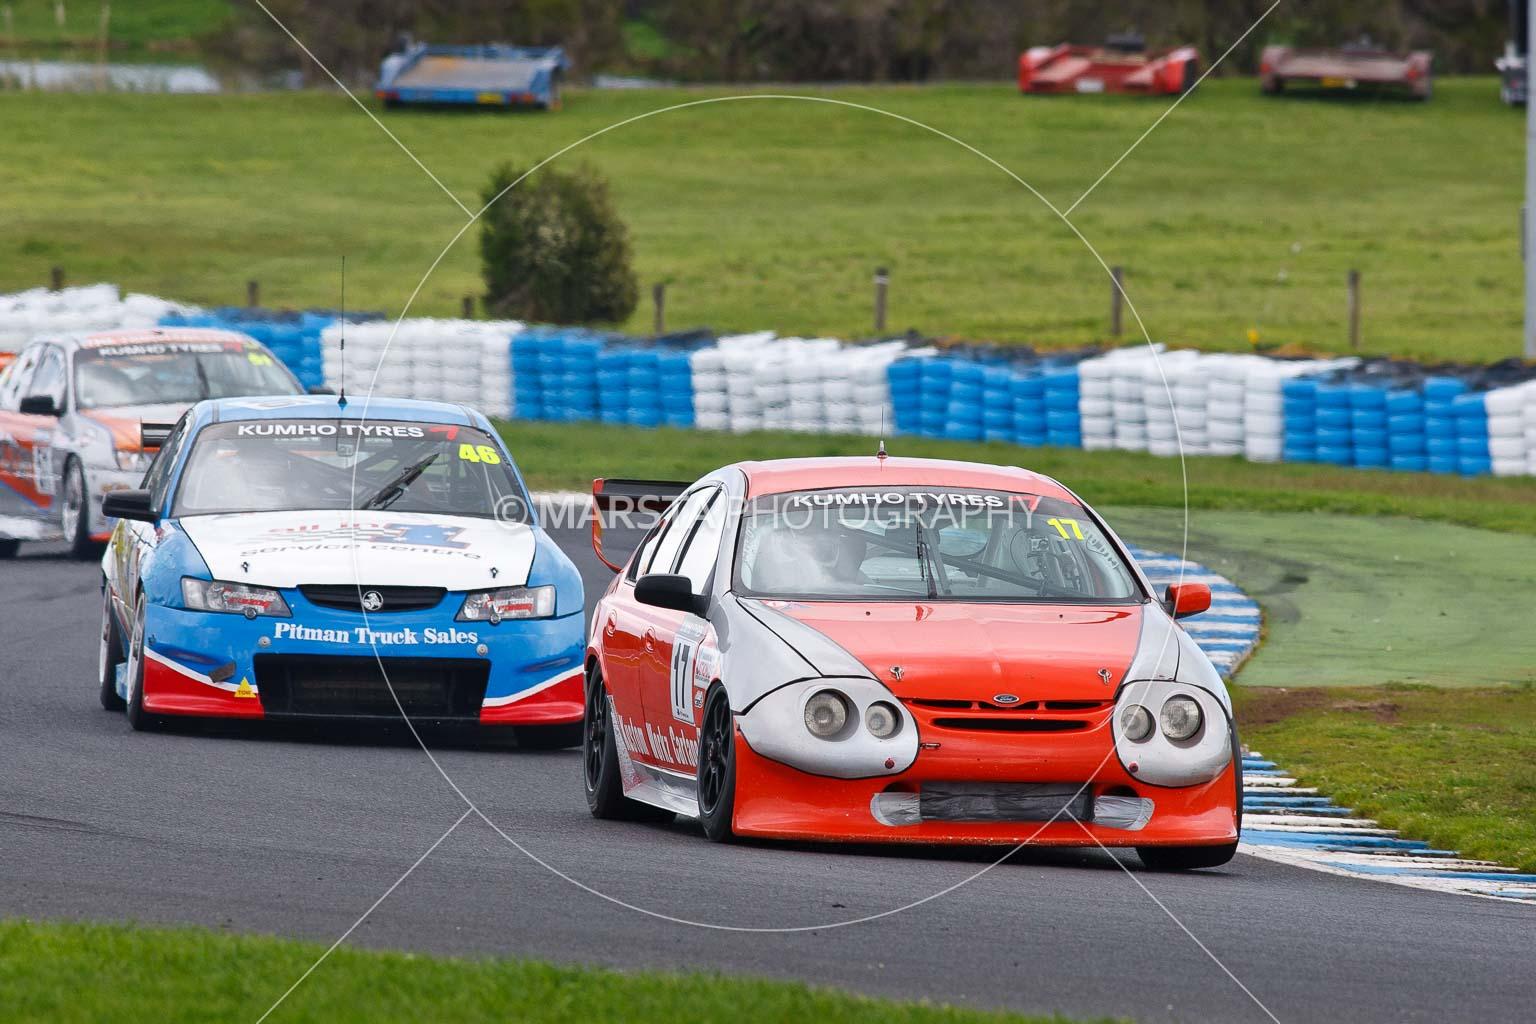 (17);17;23 September 2012;Australia;Ford Falcon AU;Phillip Island;Shane Hunt;Shannons Nationals;V8 Touring Cars;VIC;Victoria;auto;motorsport;racing;super telephoto